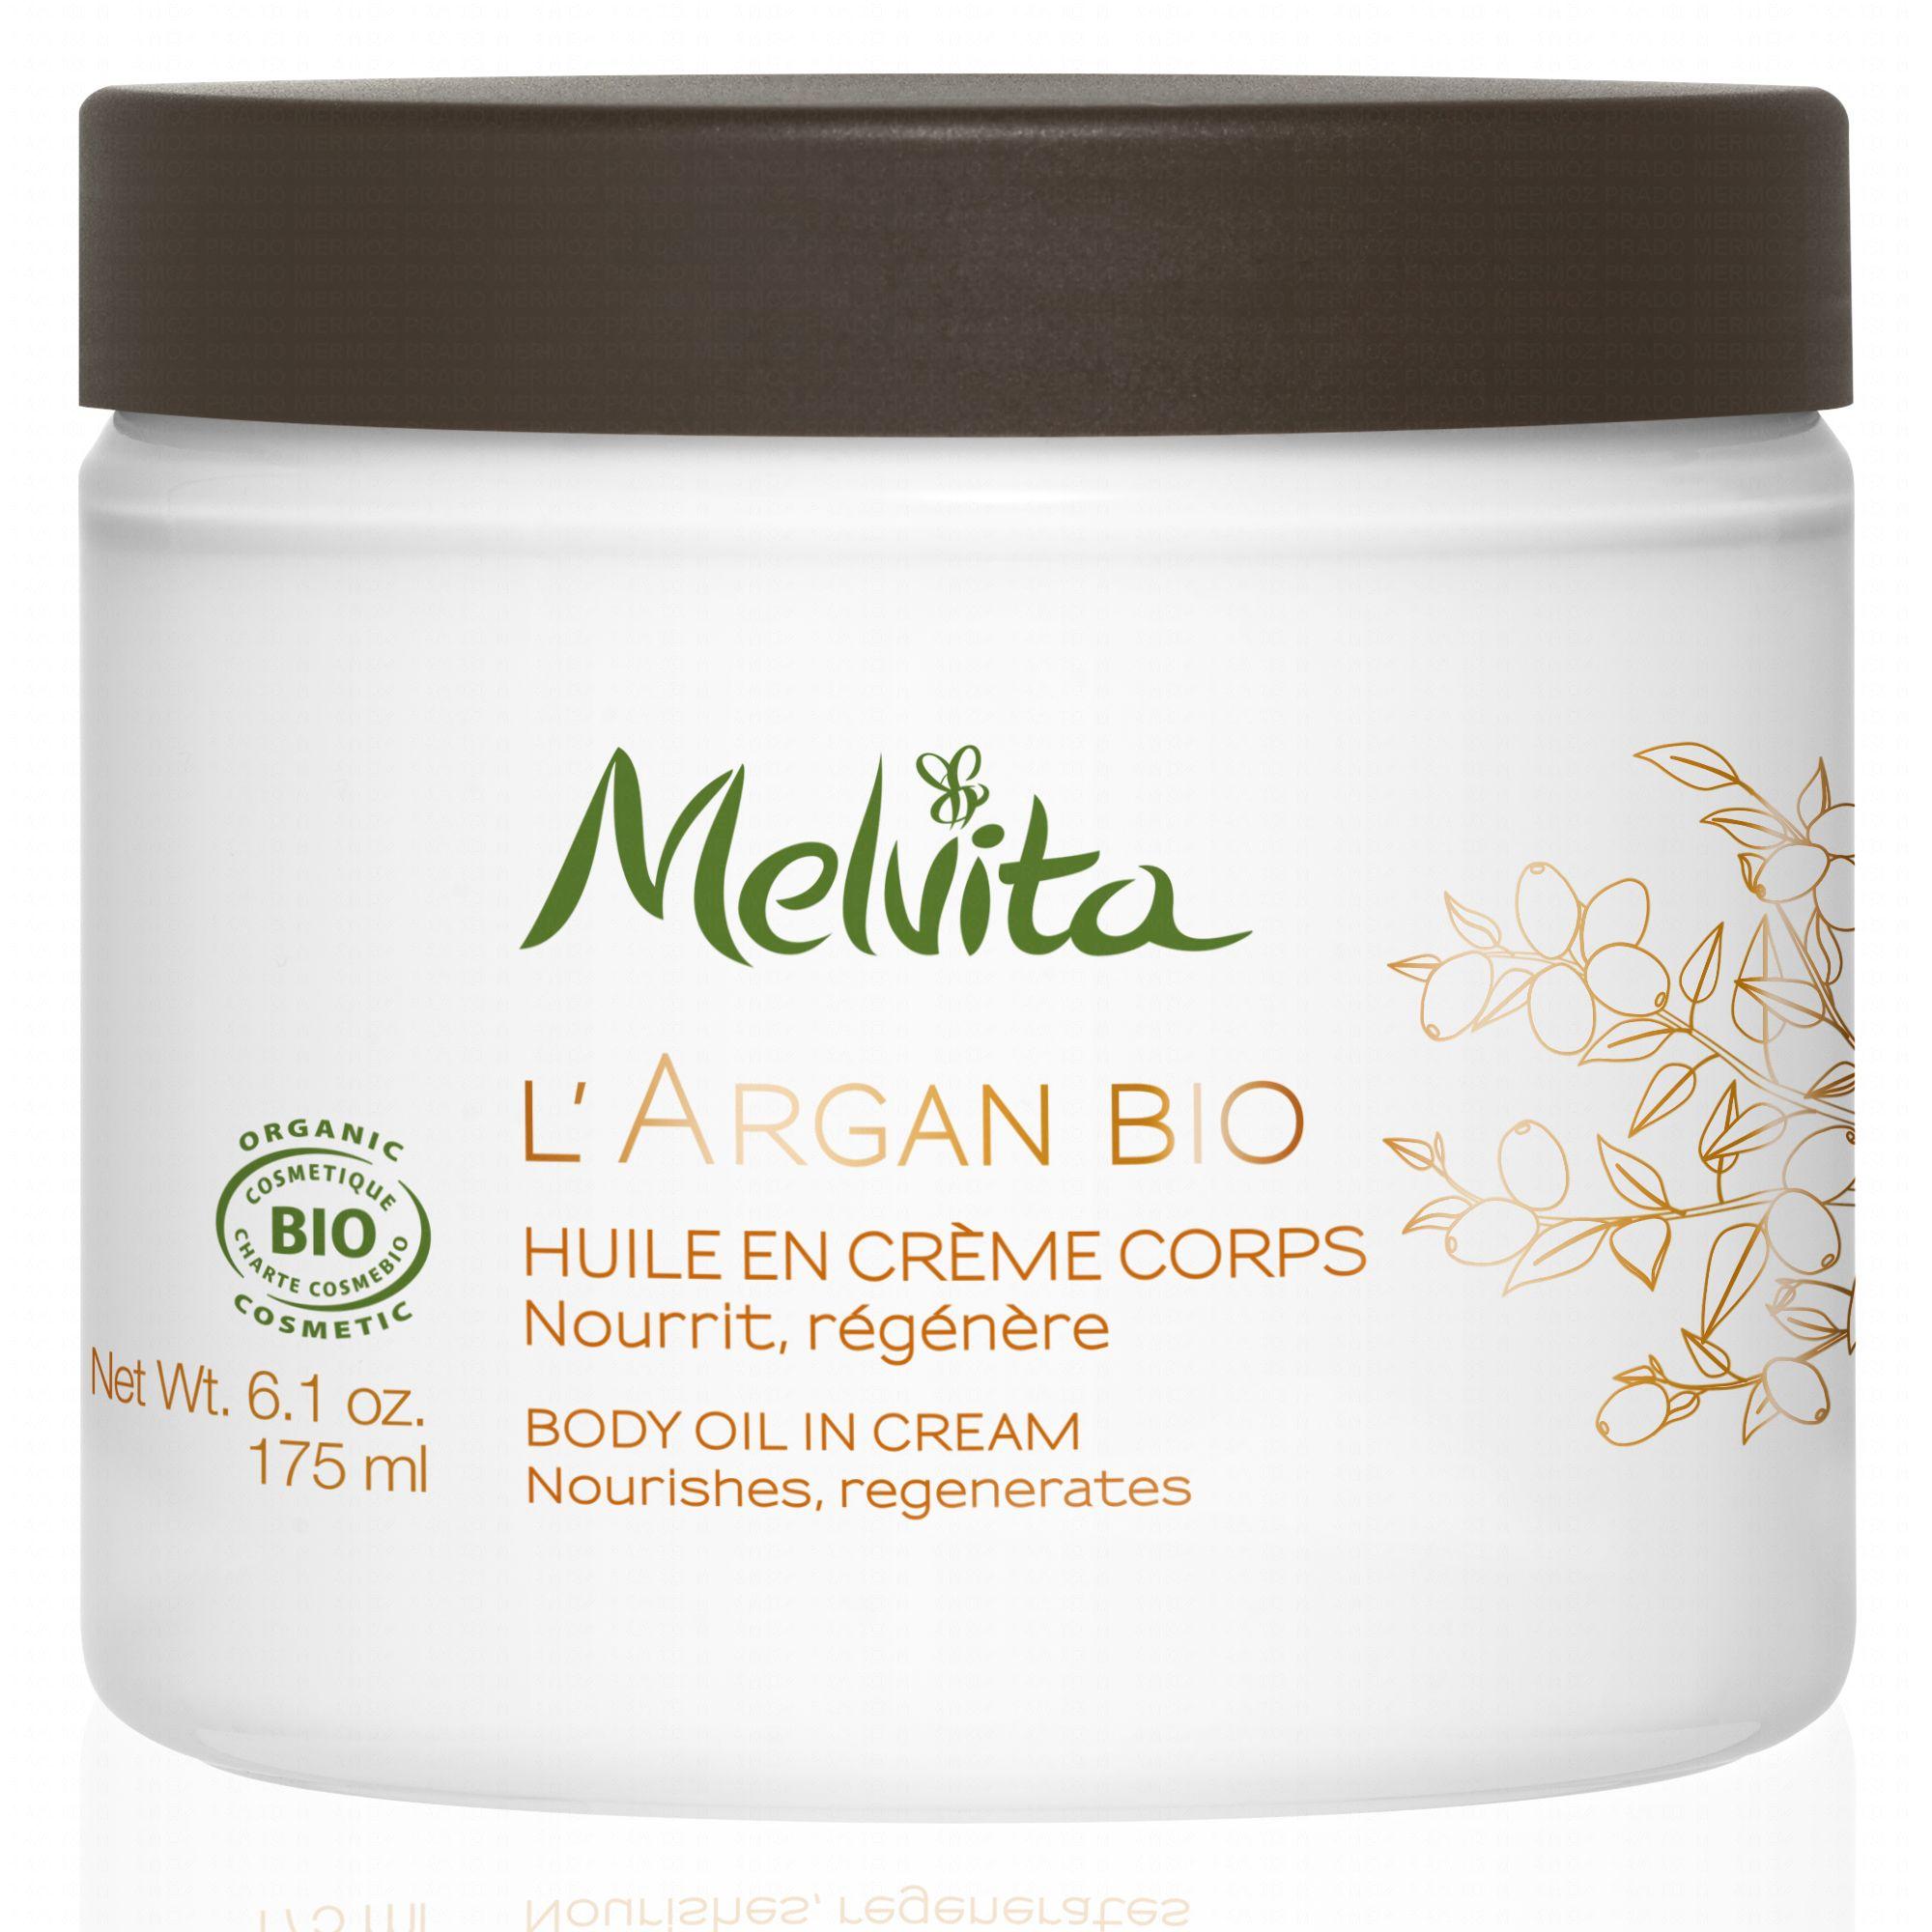 Melvita Huile en crème corps Argan pot 175 ml